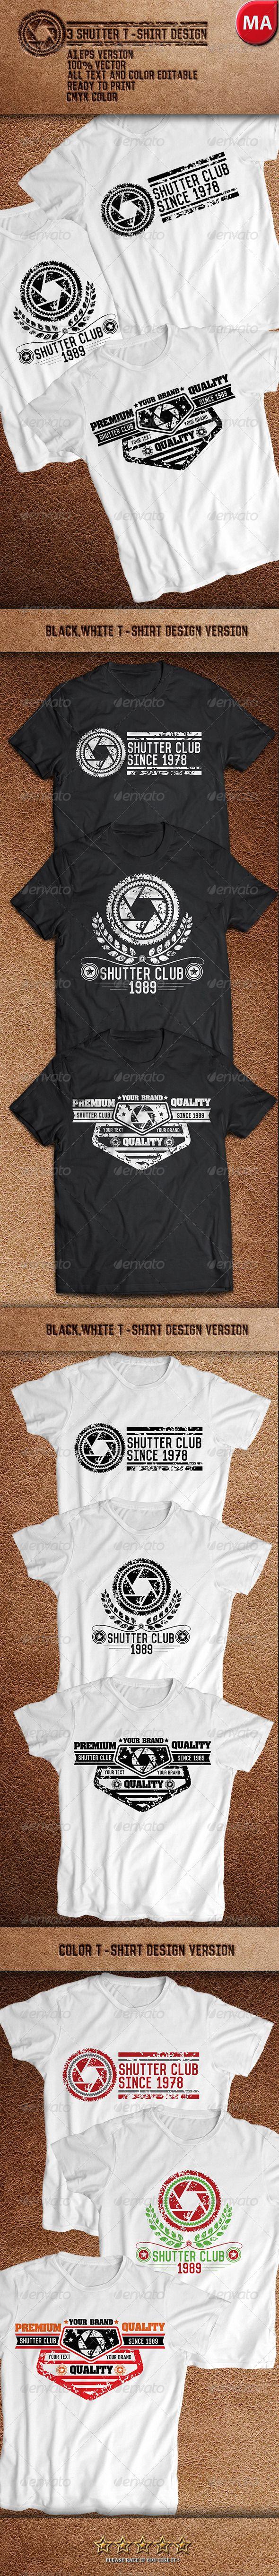 359 best t shirt design images on pinterest font logo shirt